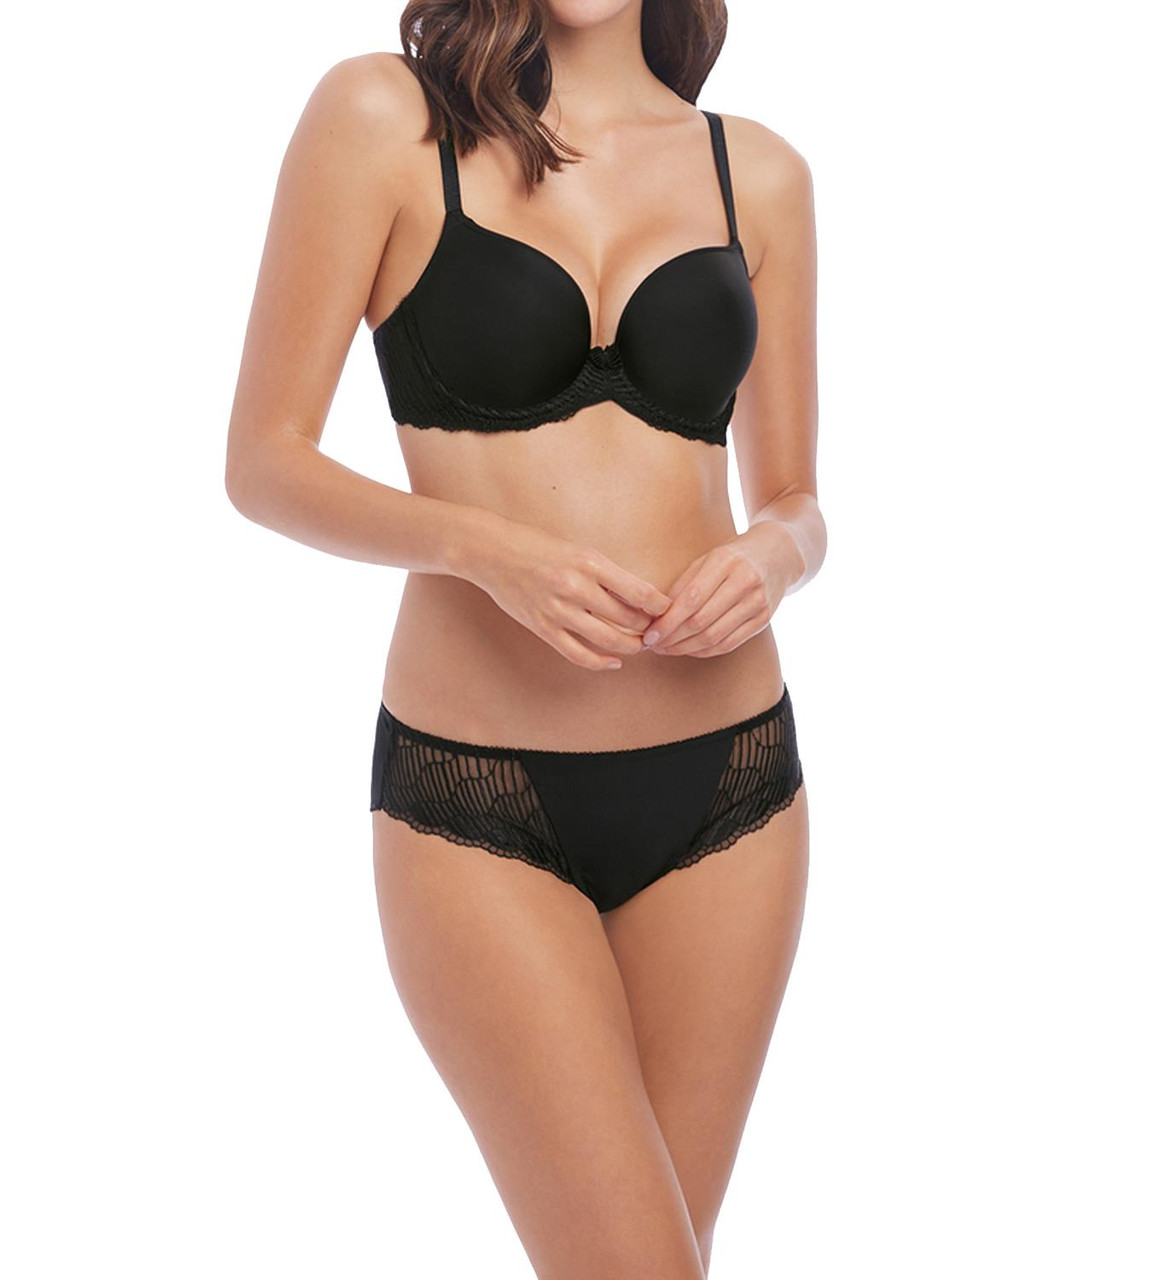 Wacoal La Femme WA853117 W Underwired Contour Bra Nude NUE 32F CS